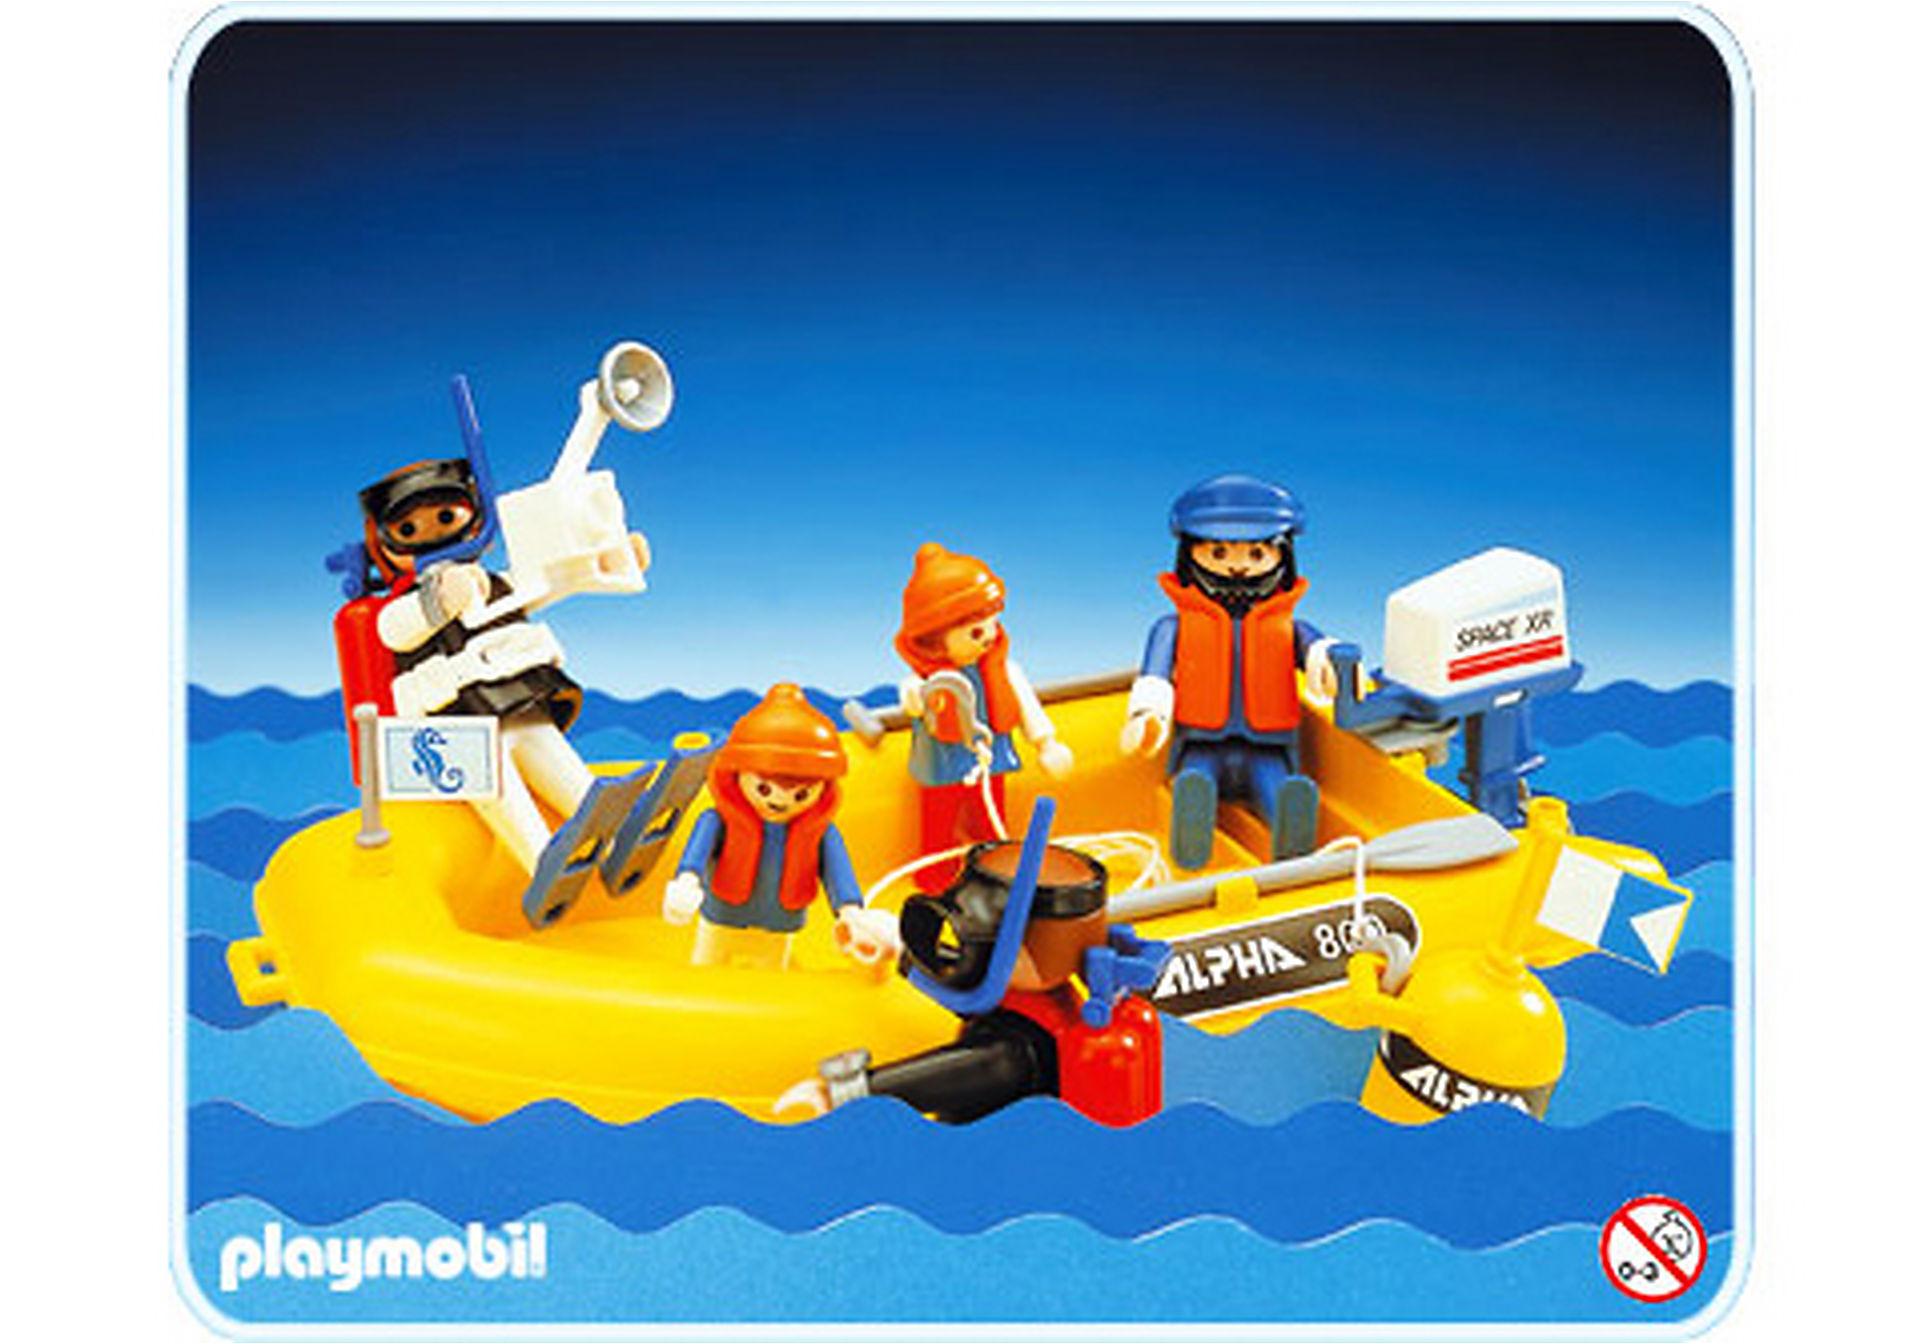 3479-A plongeur zoom image1